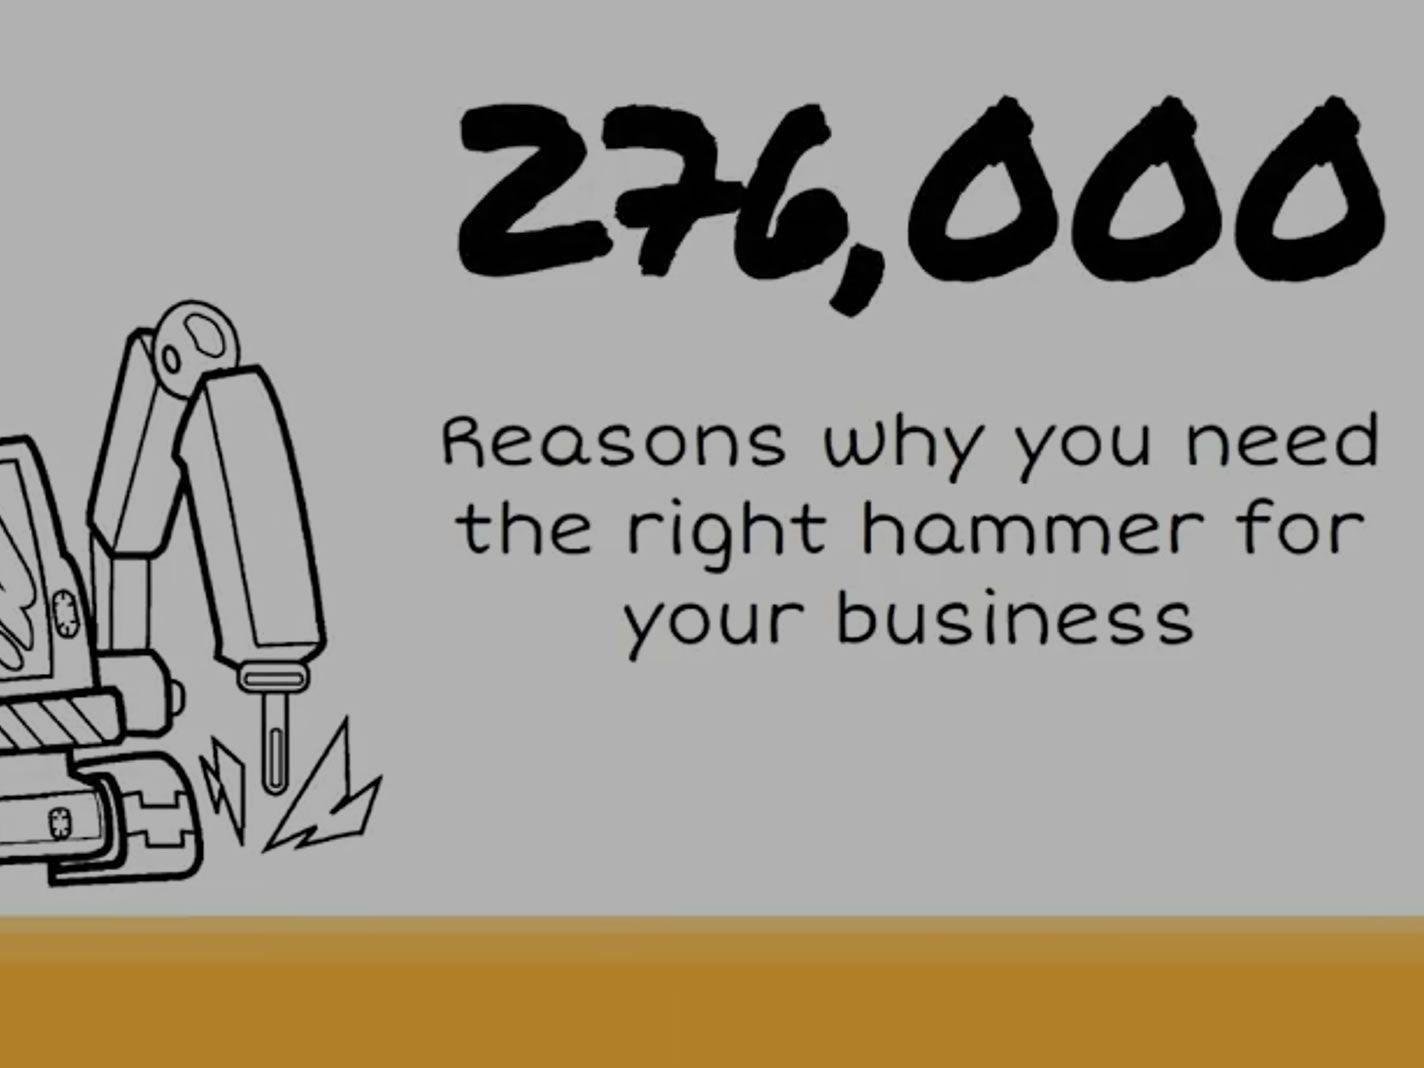 276,000 Reasons